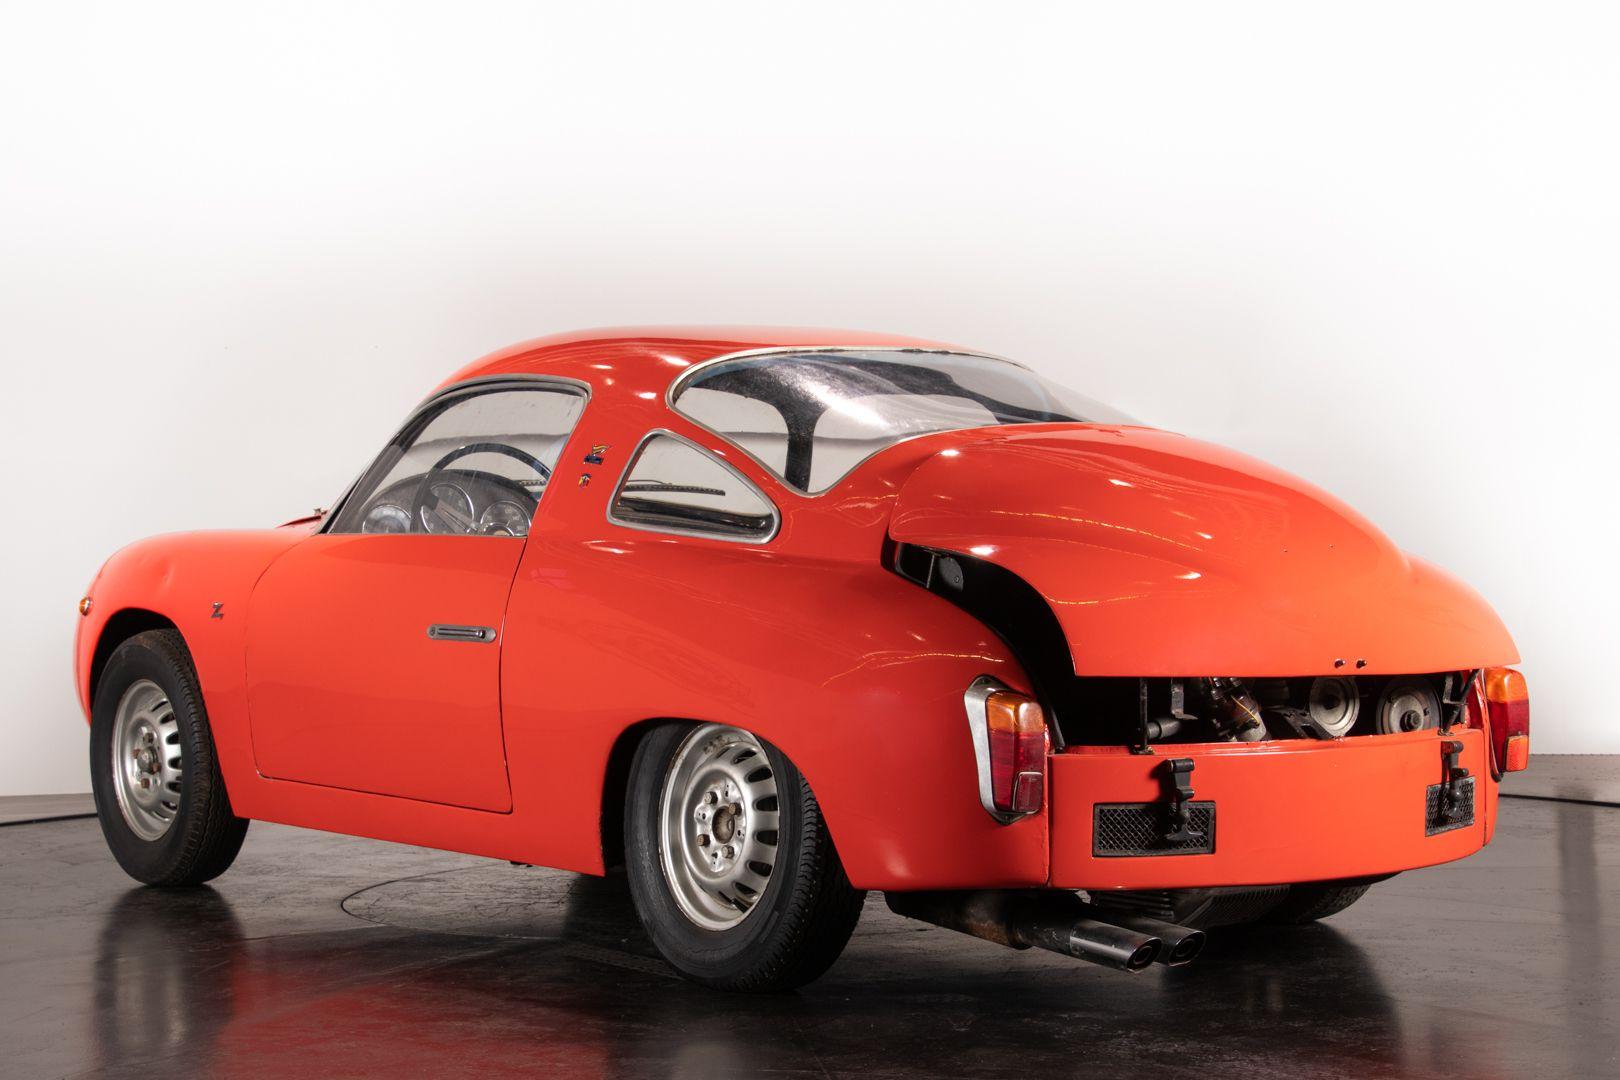 1960 Fiat Abarth 750 Bialbero record Monza 33321